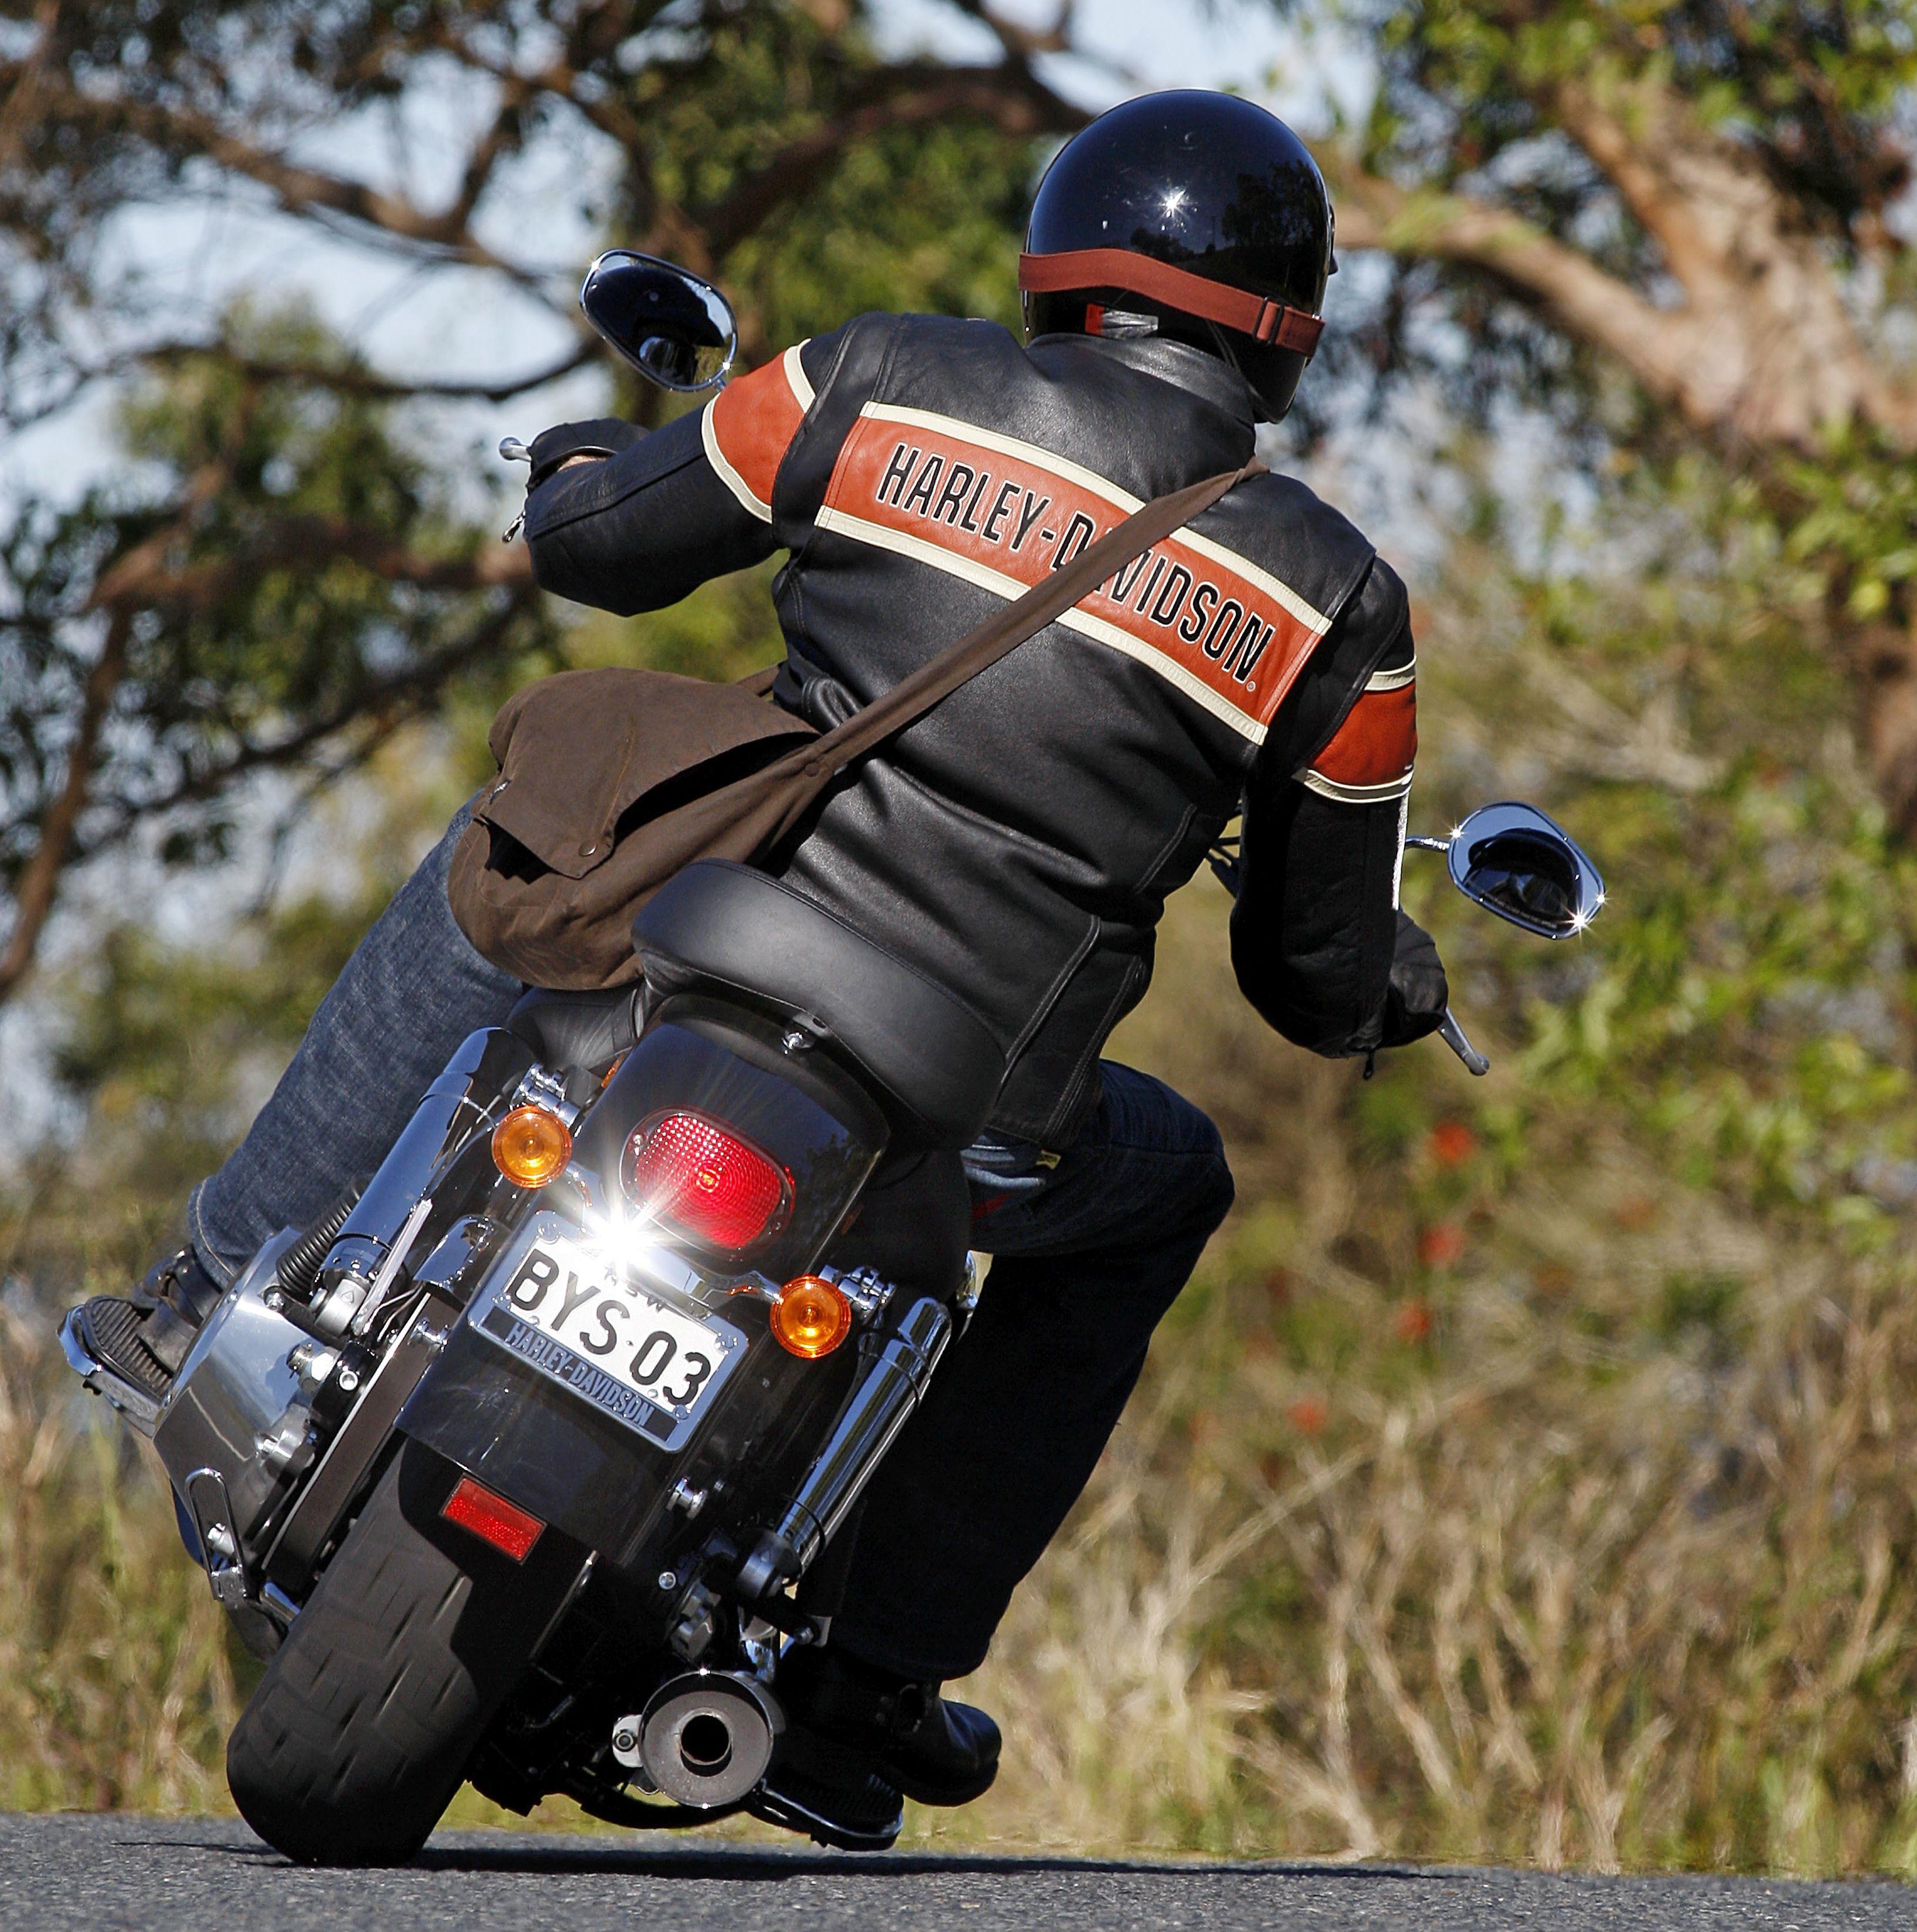 Harley Davidson Victory Lane Jacket Harley davidson